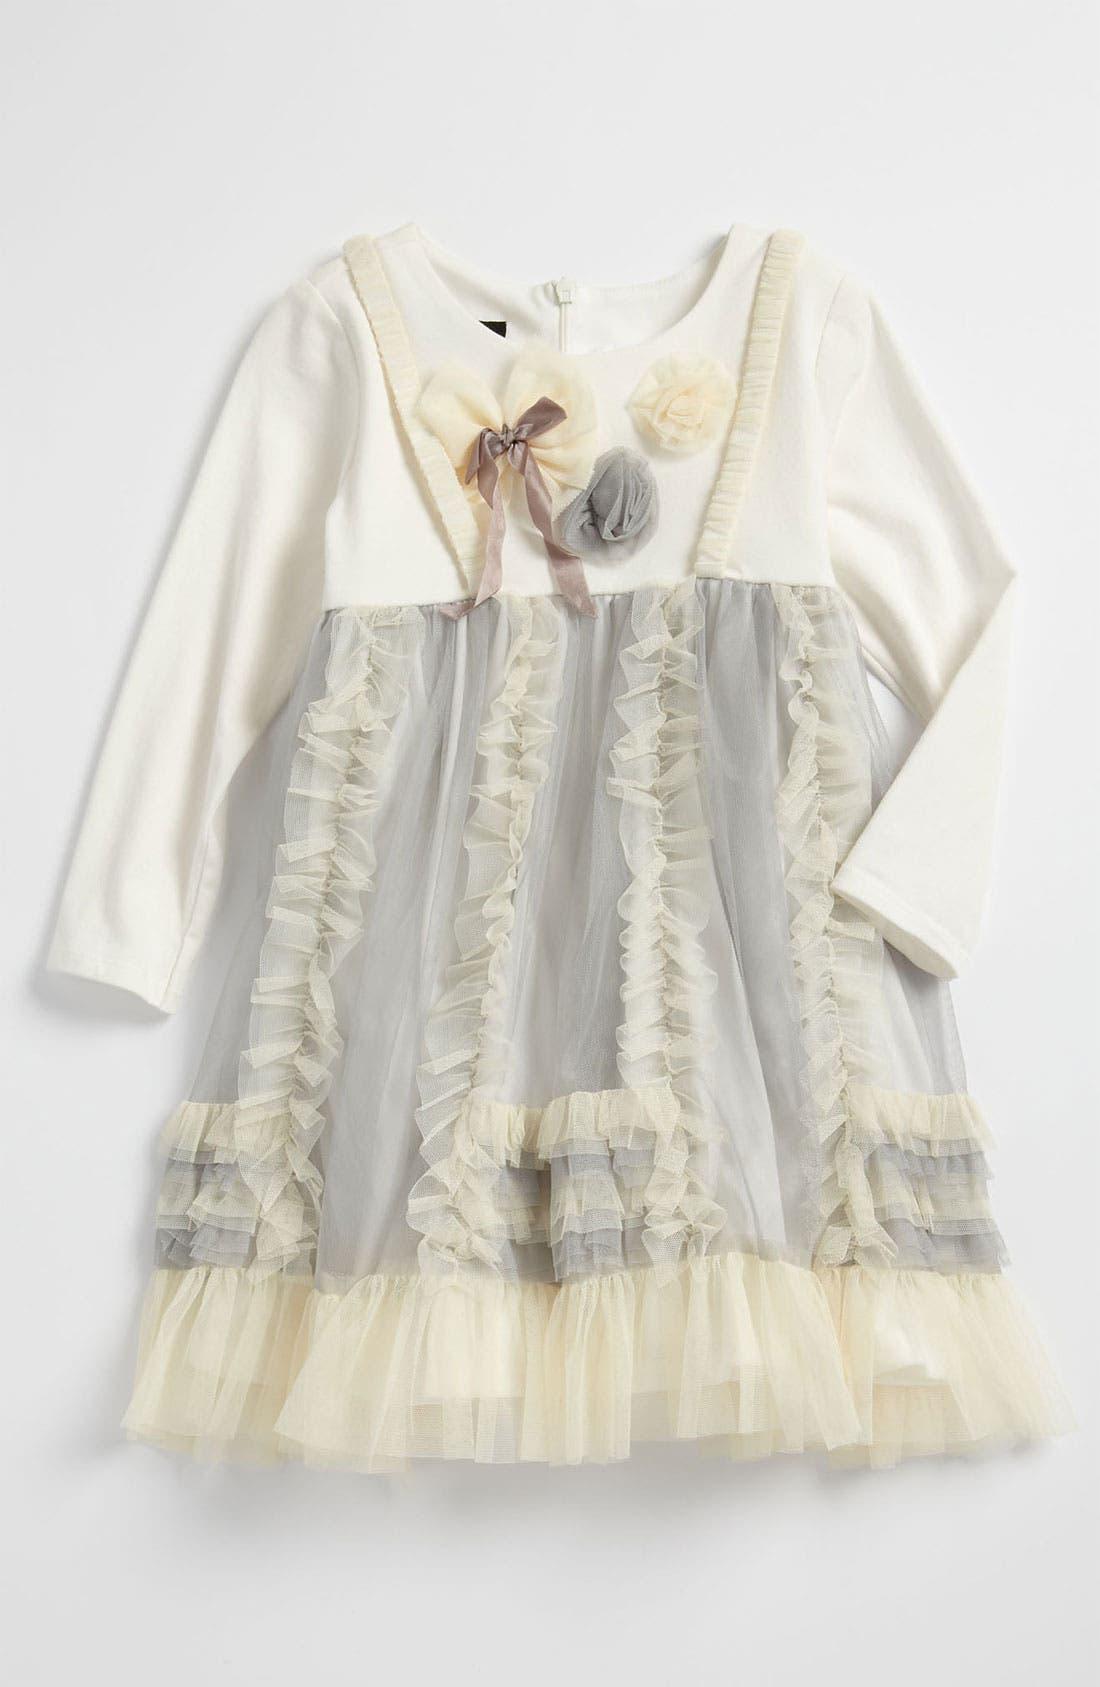 Alternate Image 1 Selected - Isobella & Chloe Mesh Dress (Toddler)